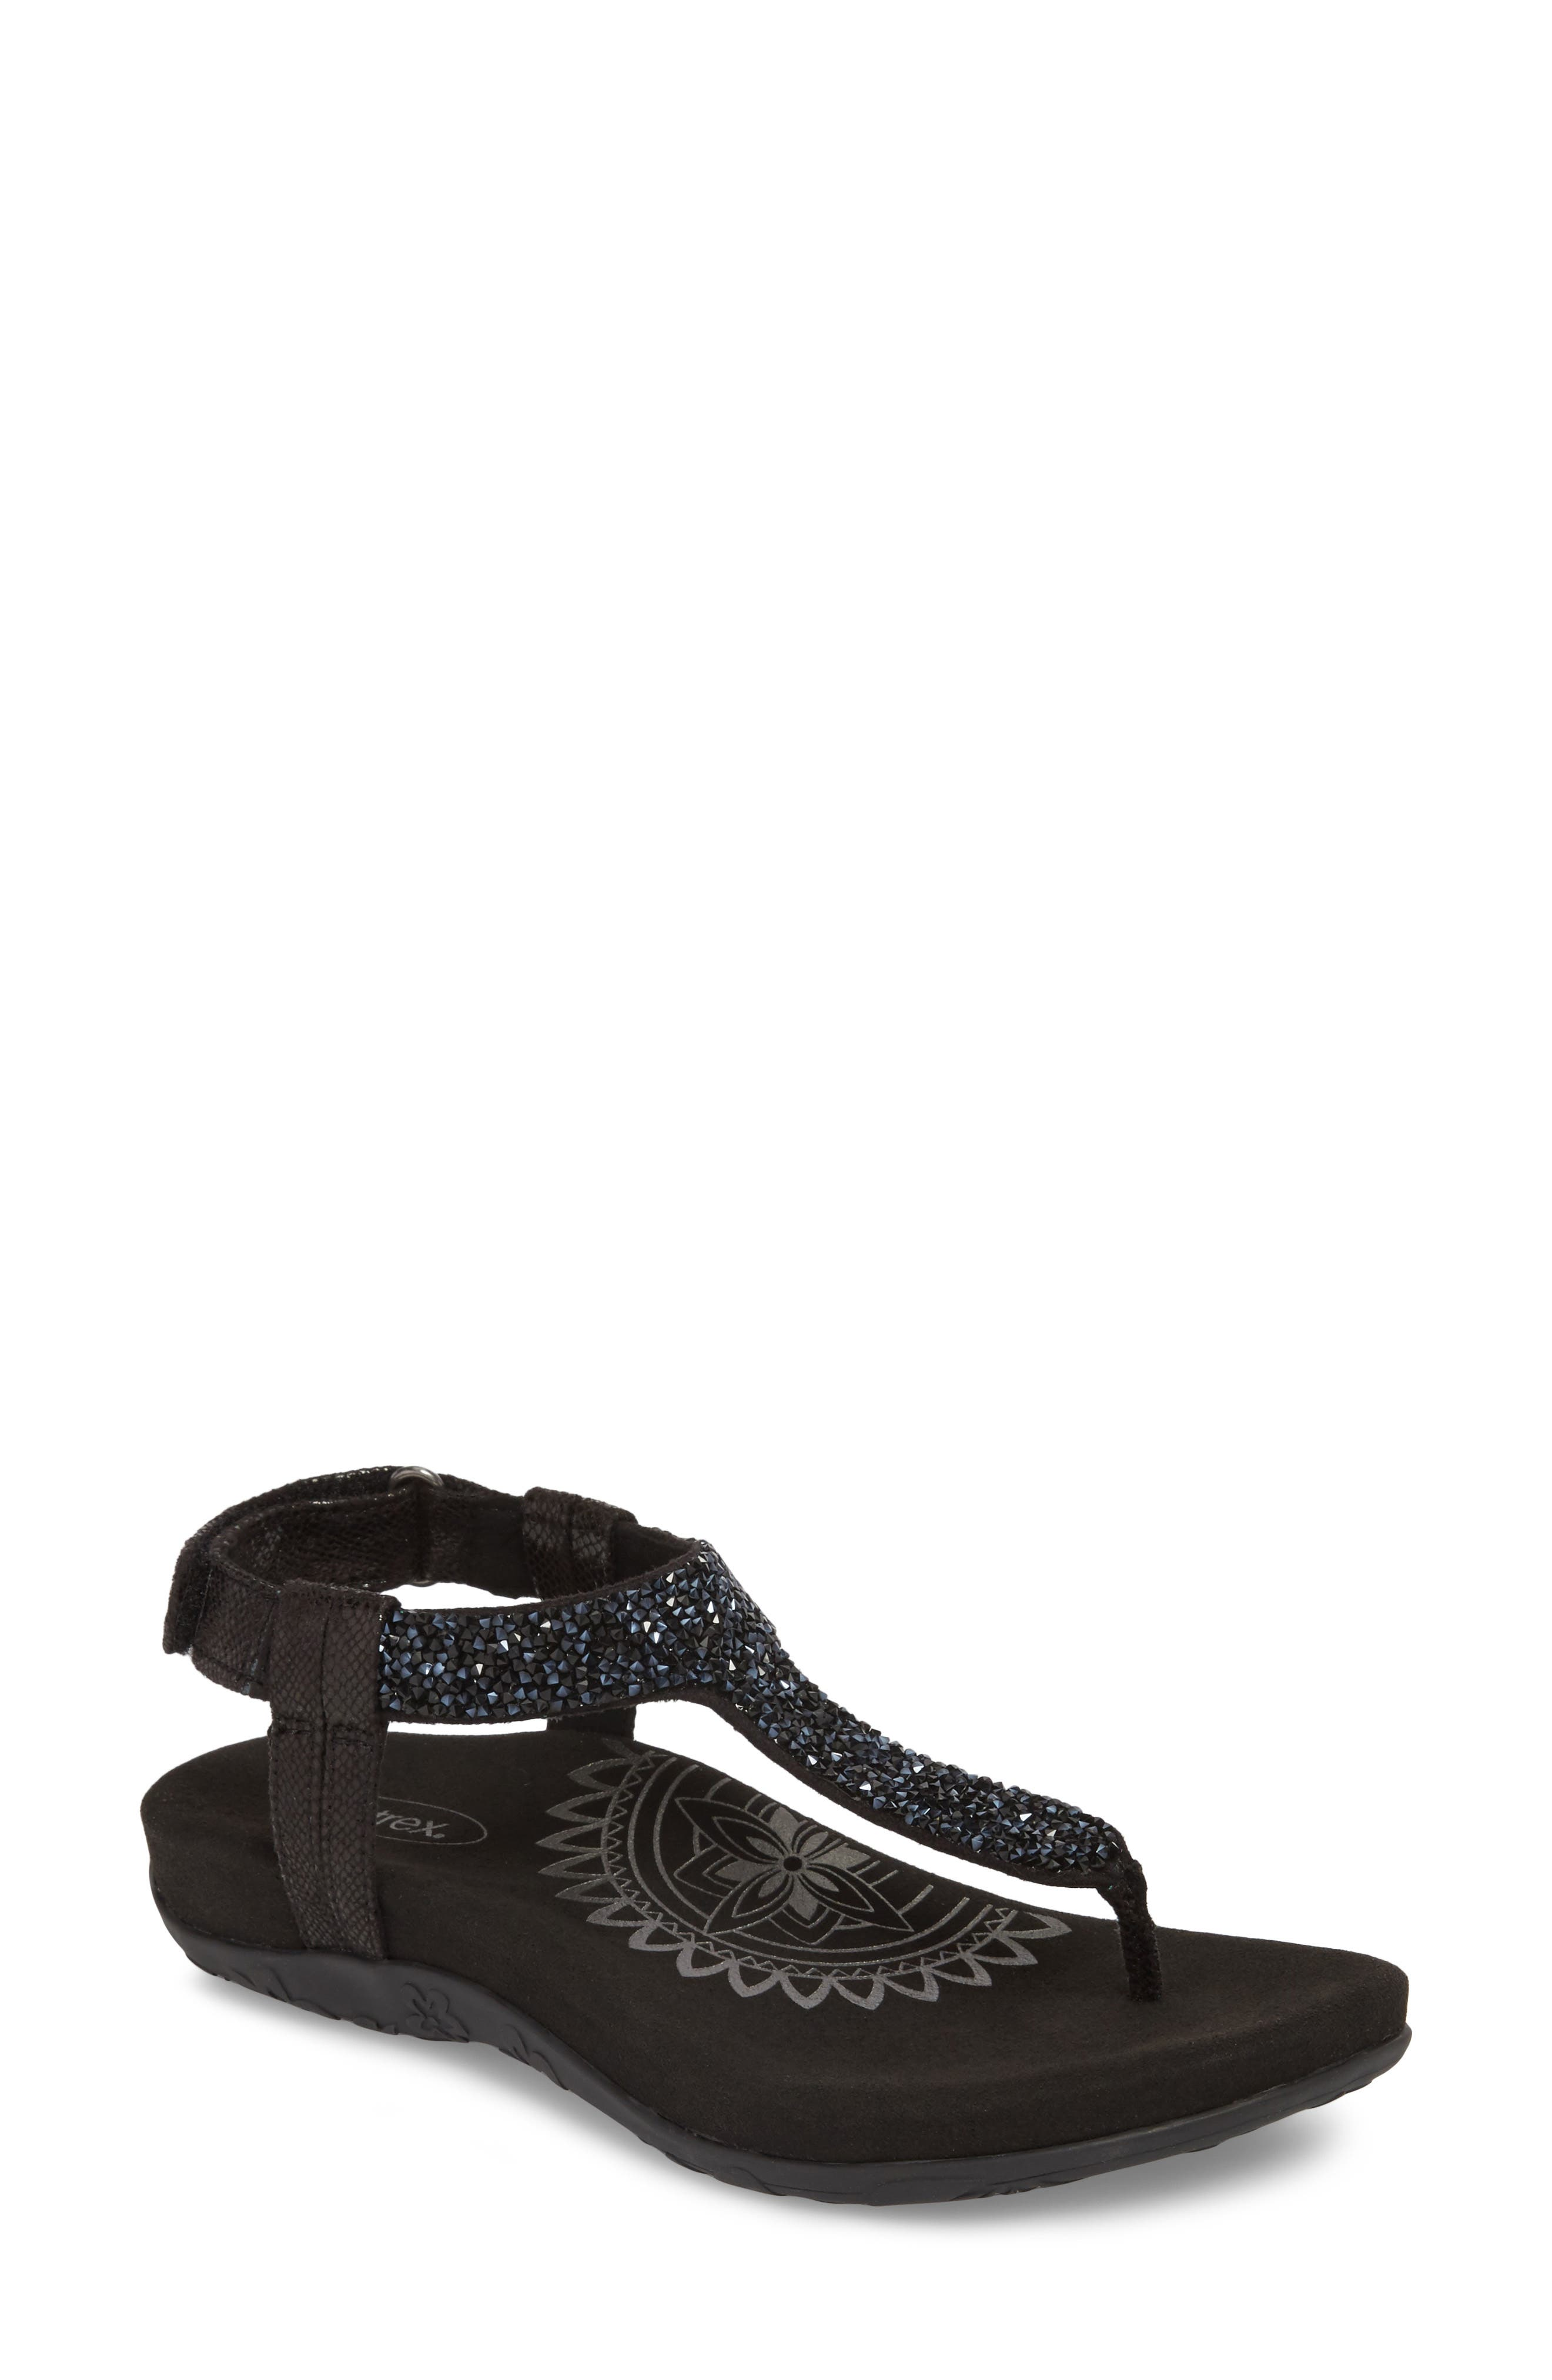 AETREX, Jade Embellished T-Strap Sandal, Main thumbnail 1, color, BLACK LEATHER